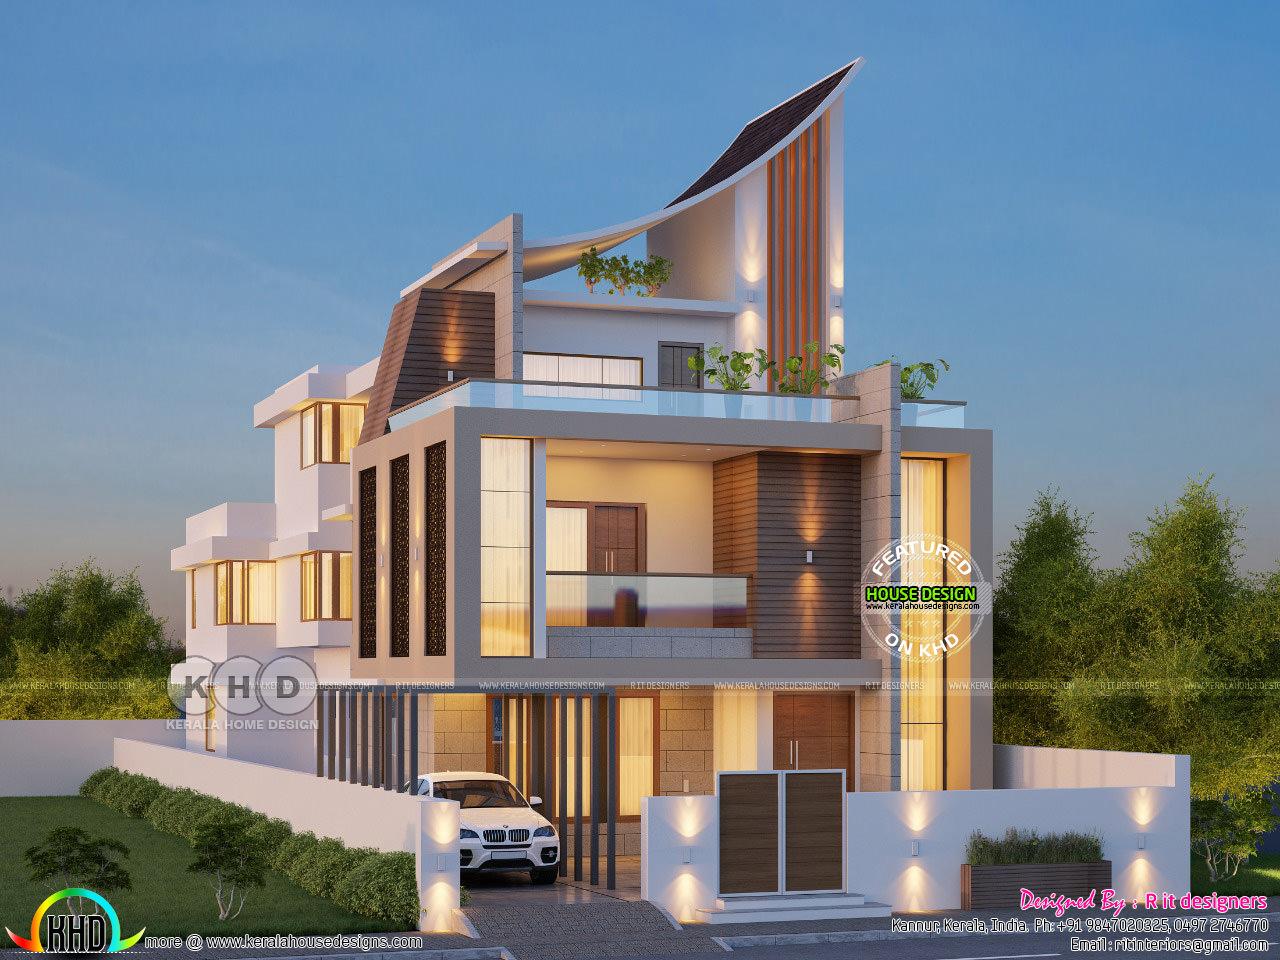 Luxurious ultra modern 5 bedroom house plan